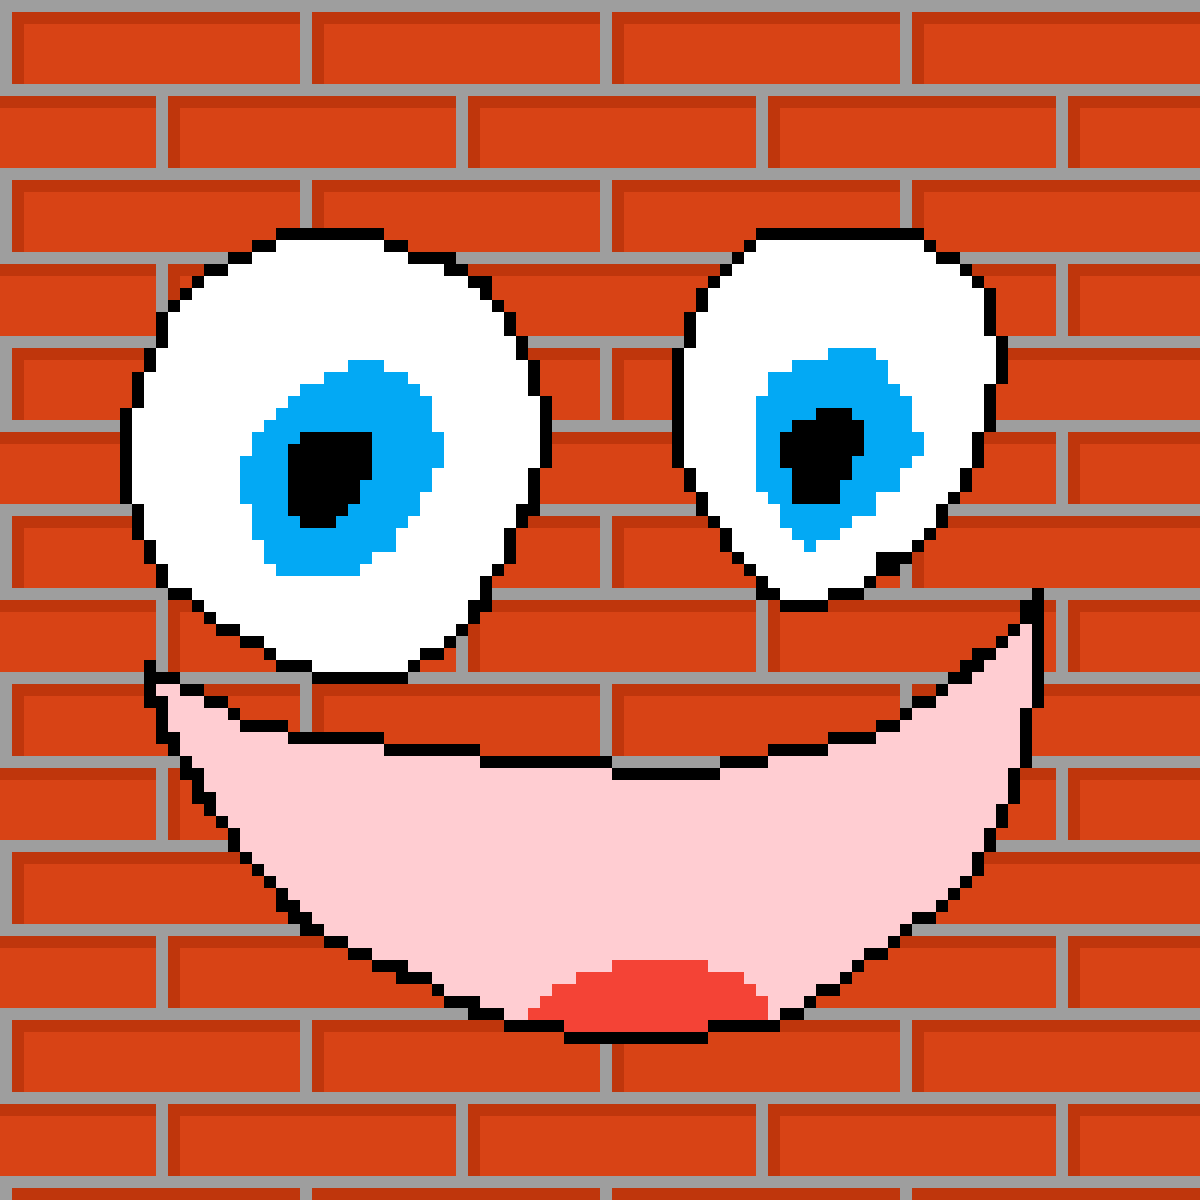 A wall by LizardmyWizard